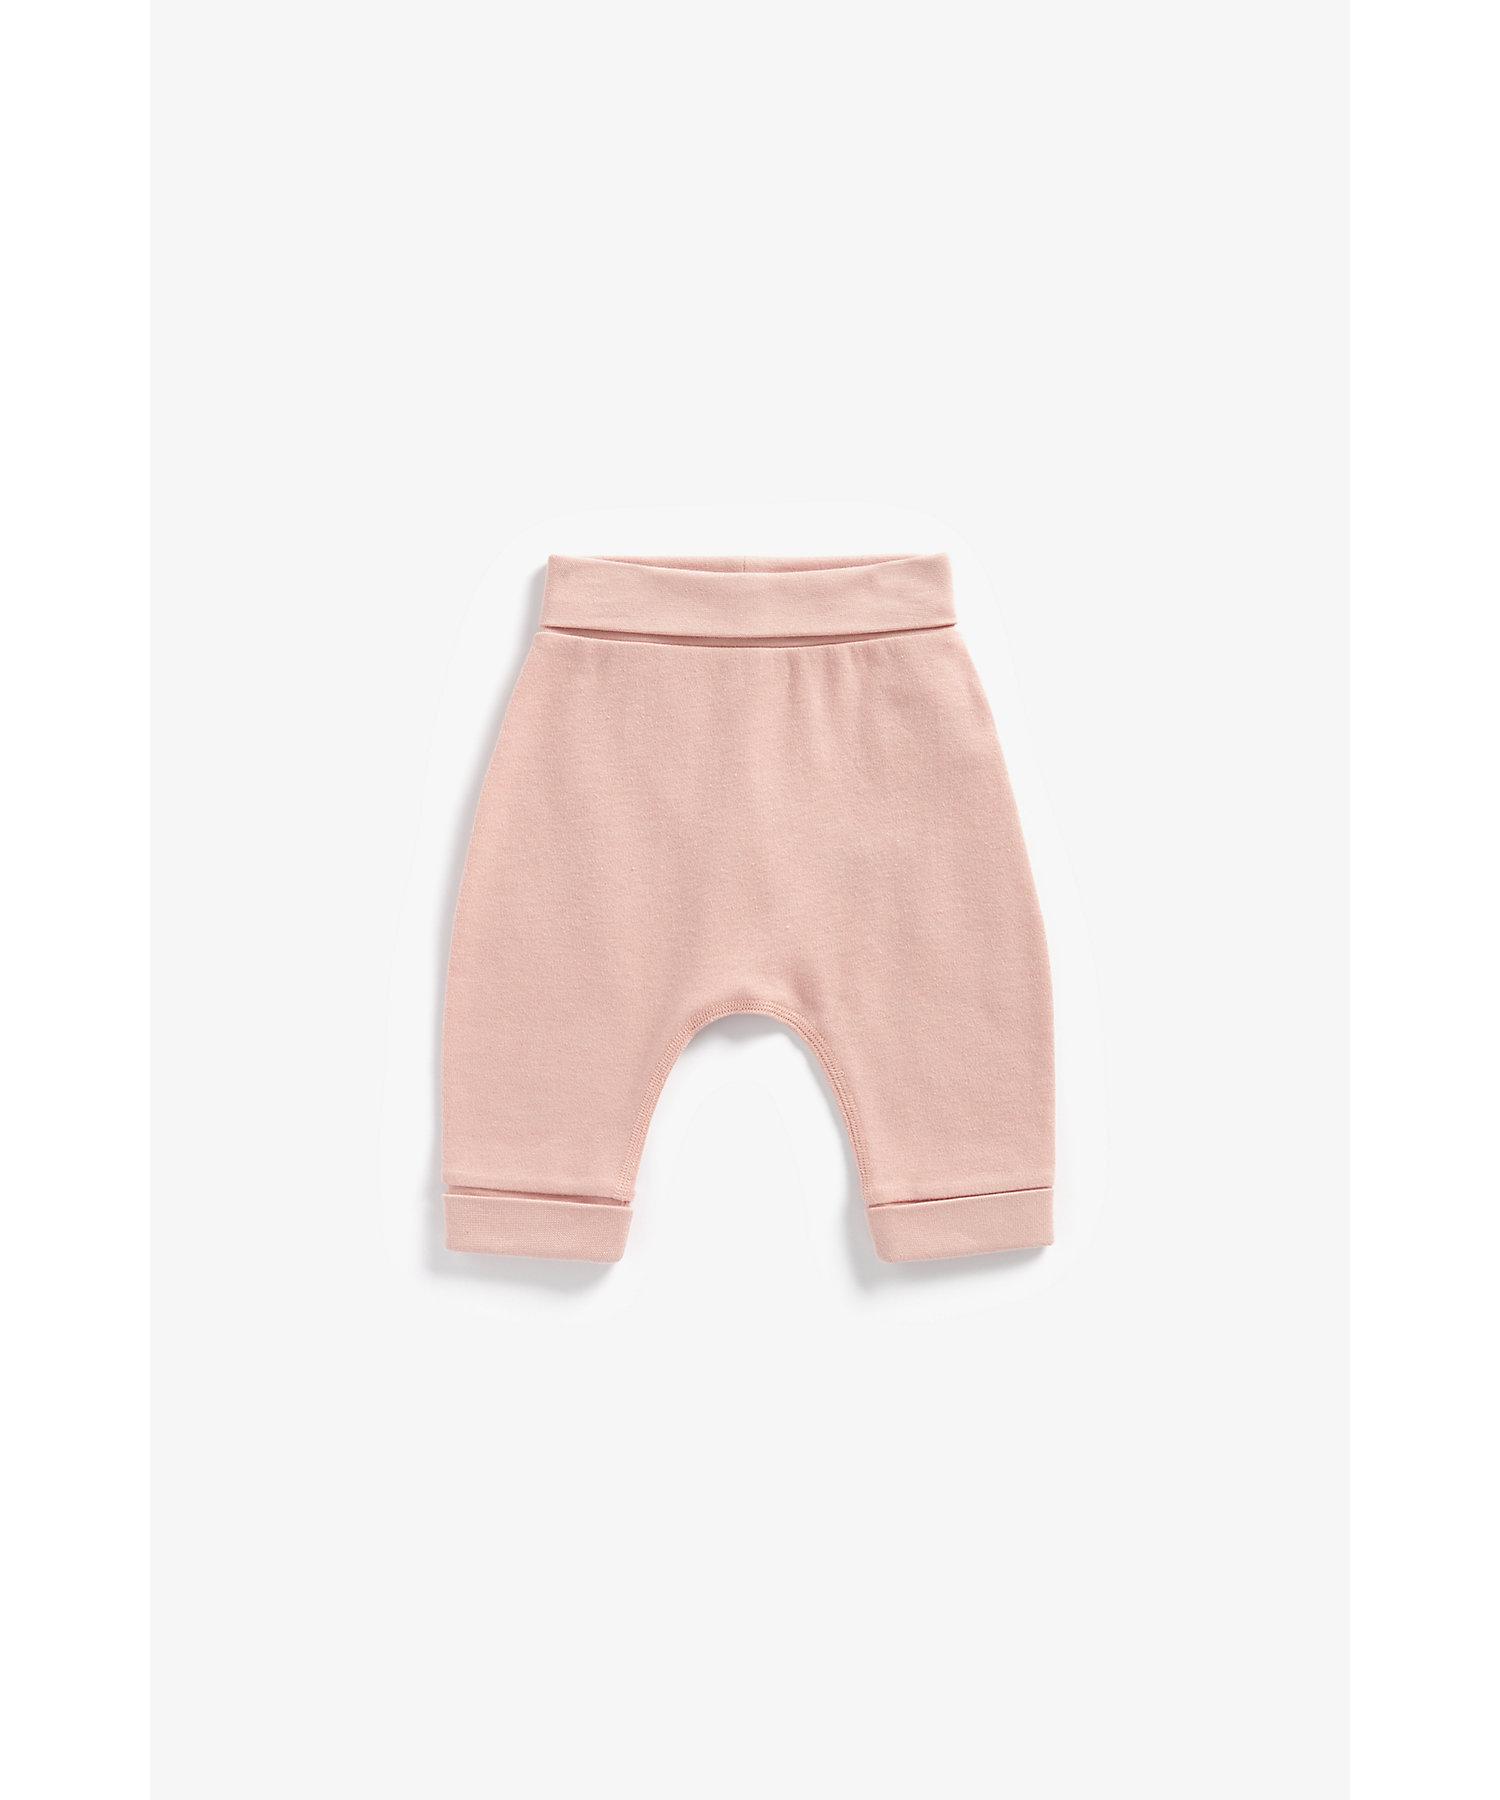 Mothercare | Girls Organic Cotton Joggers - Pink